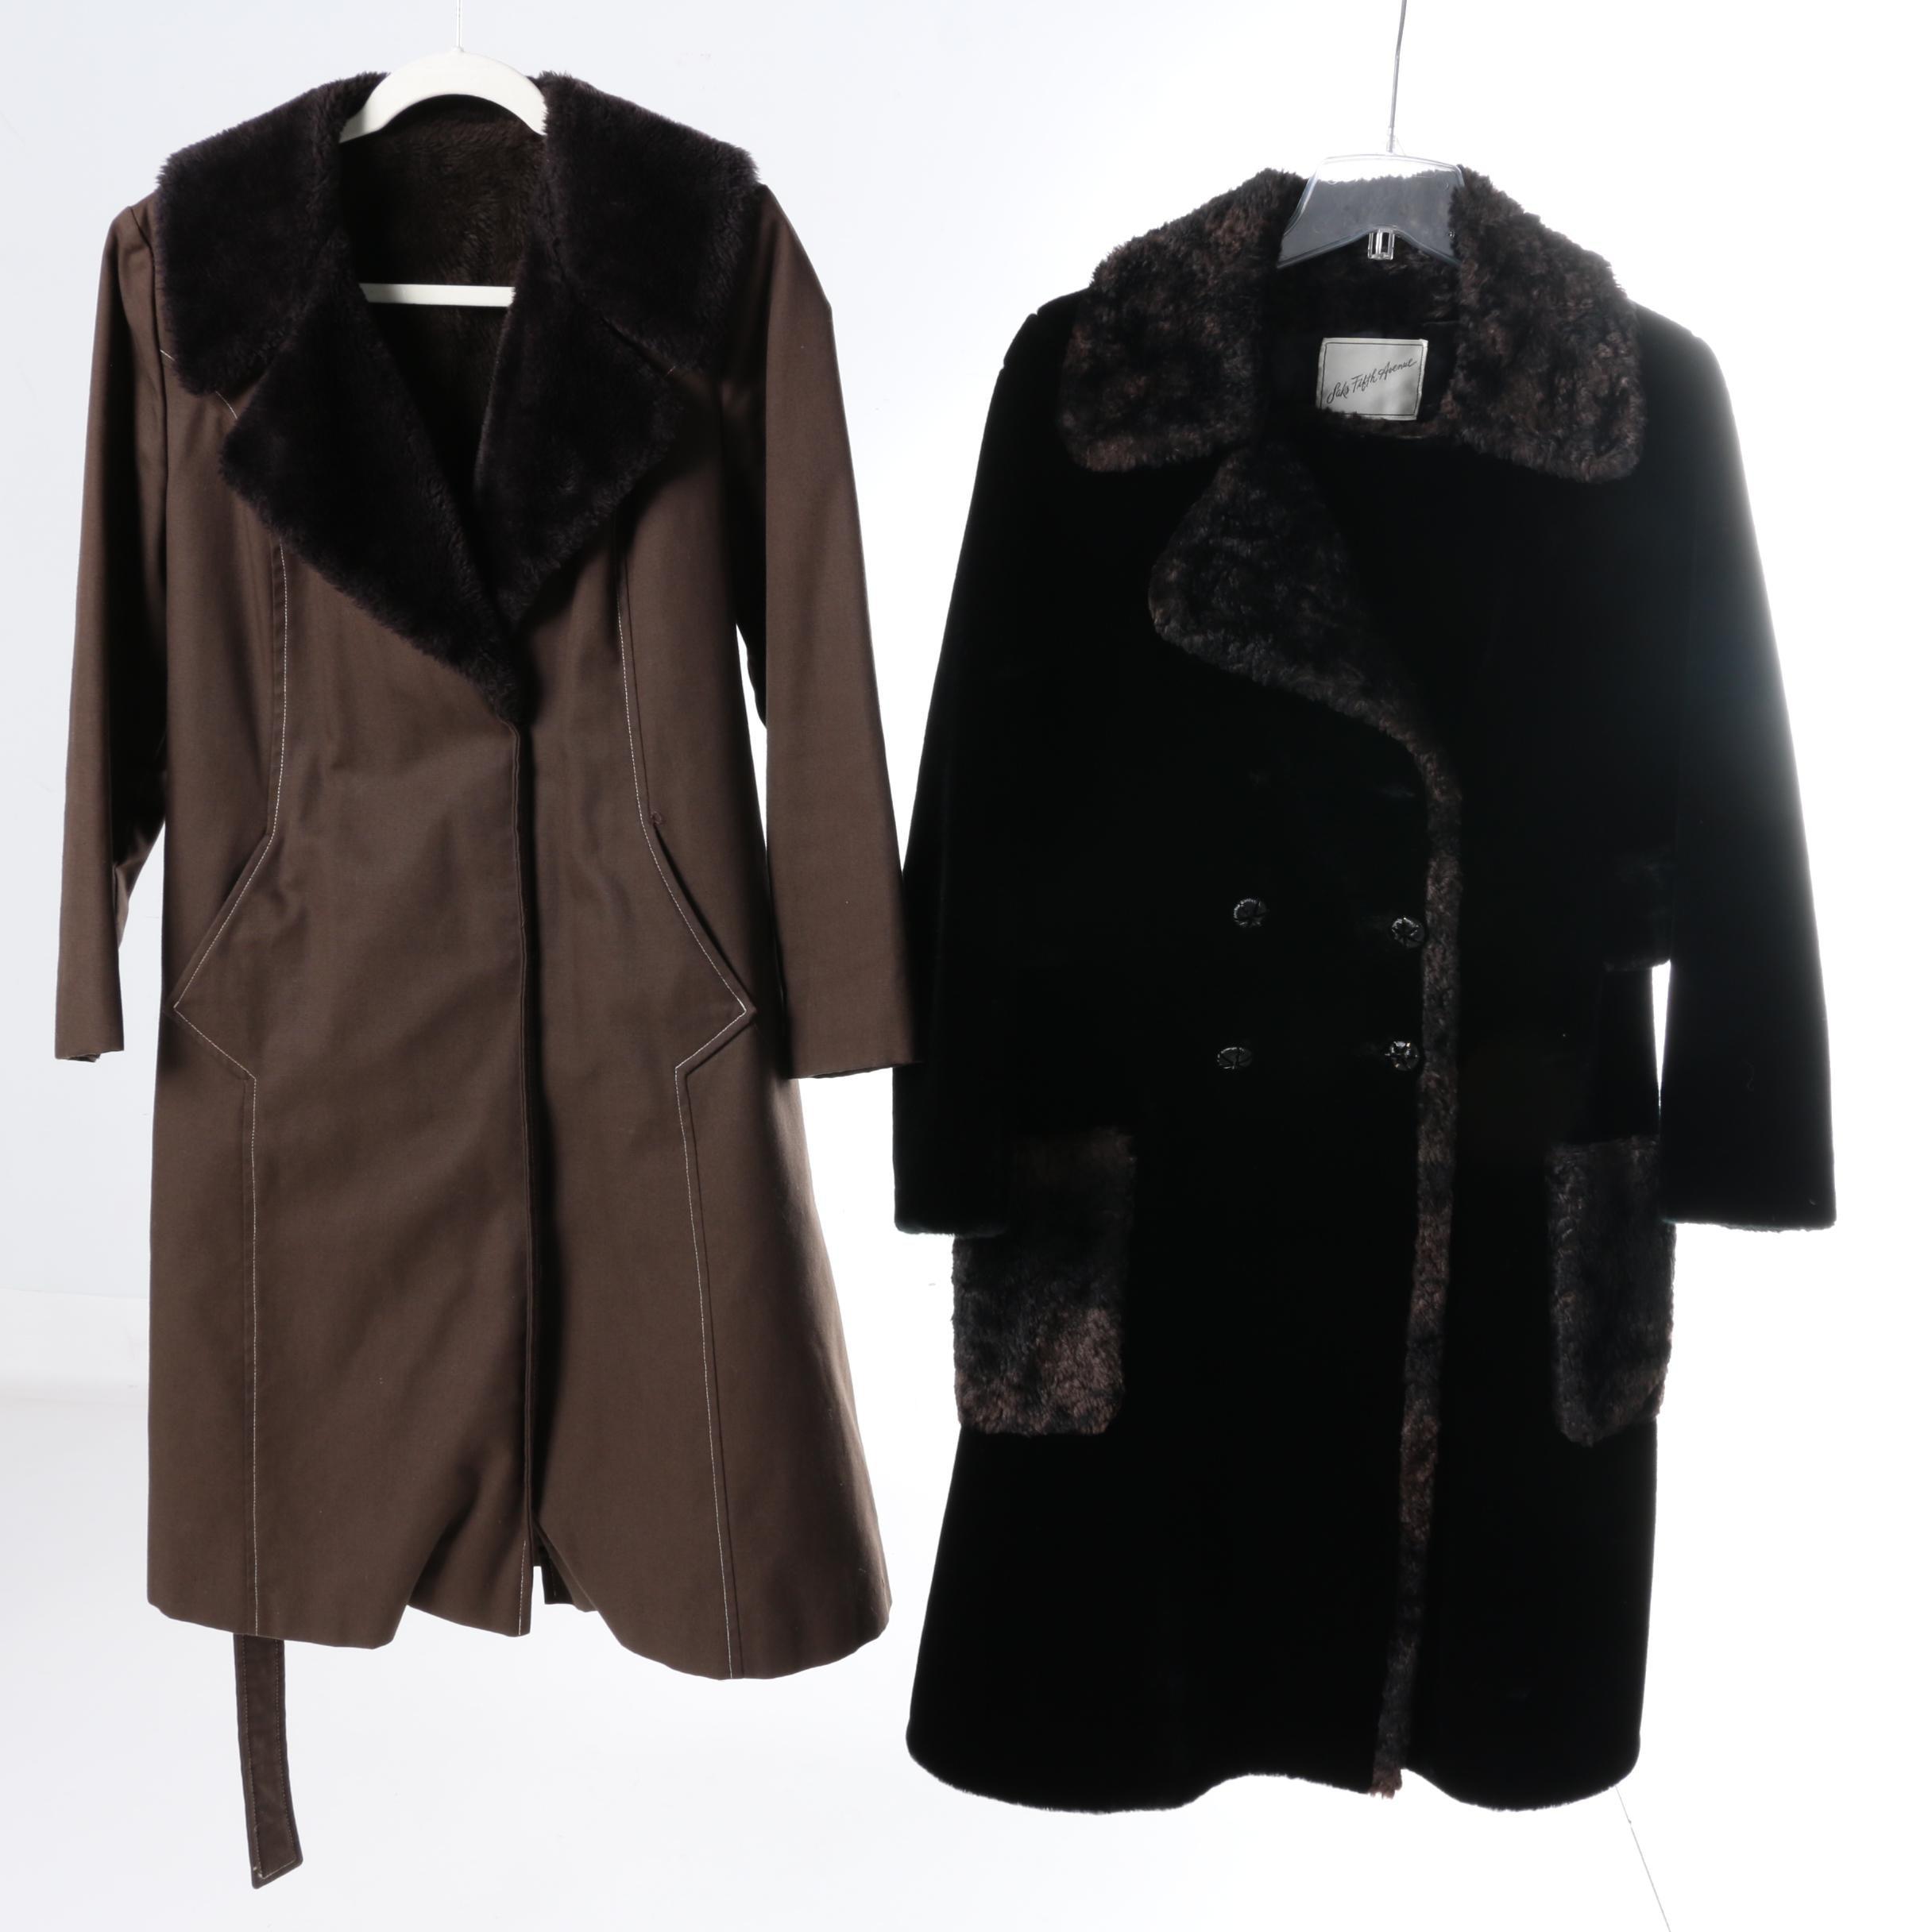 Women's Winter Coats By Borgazia and Lanson